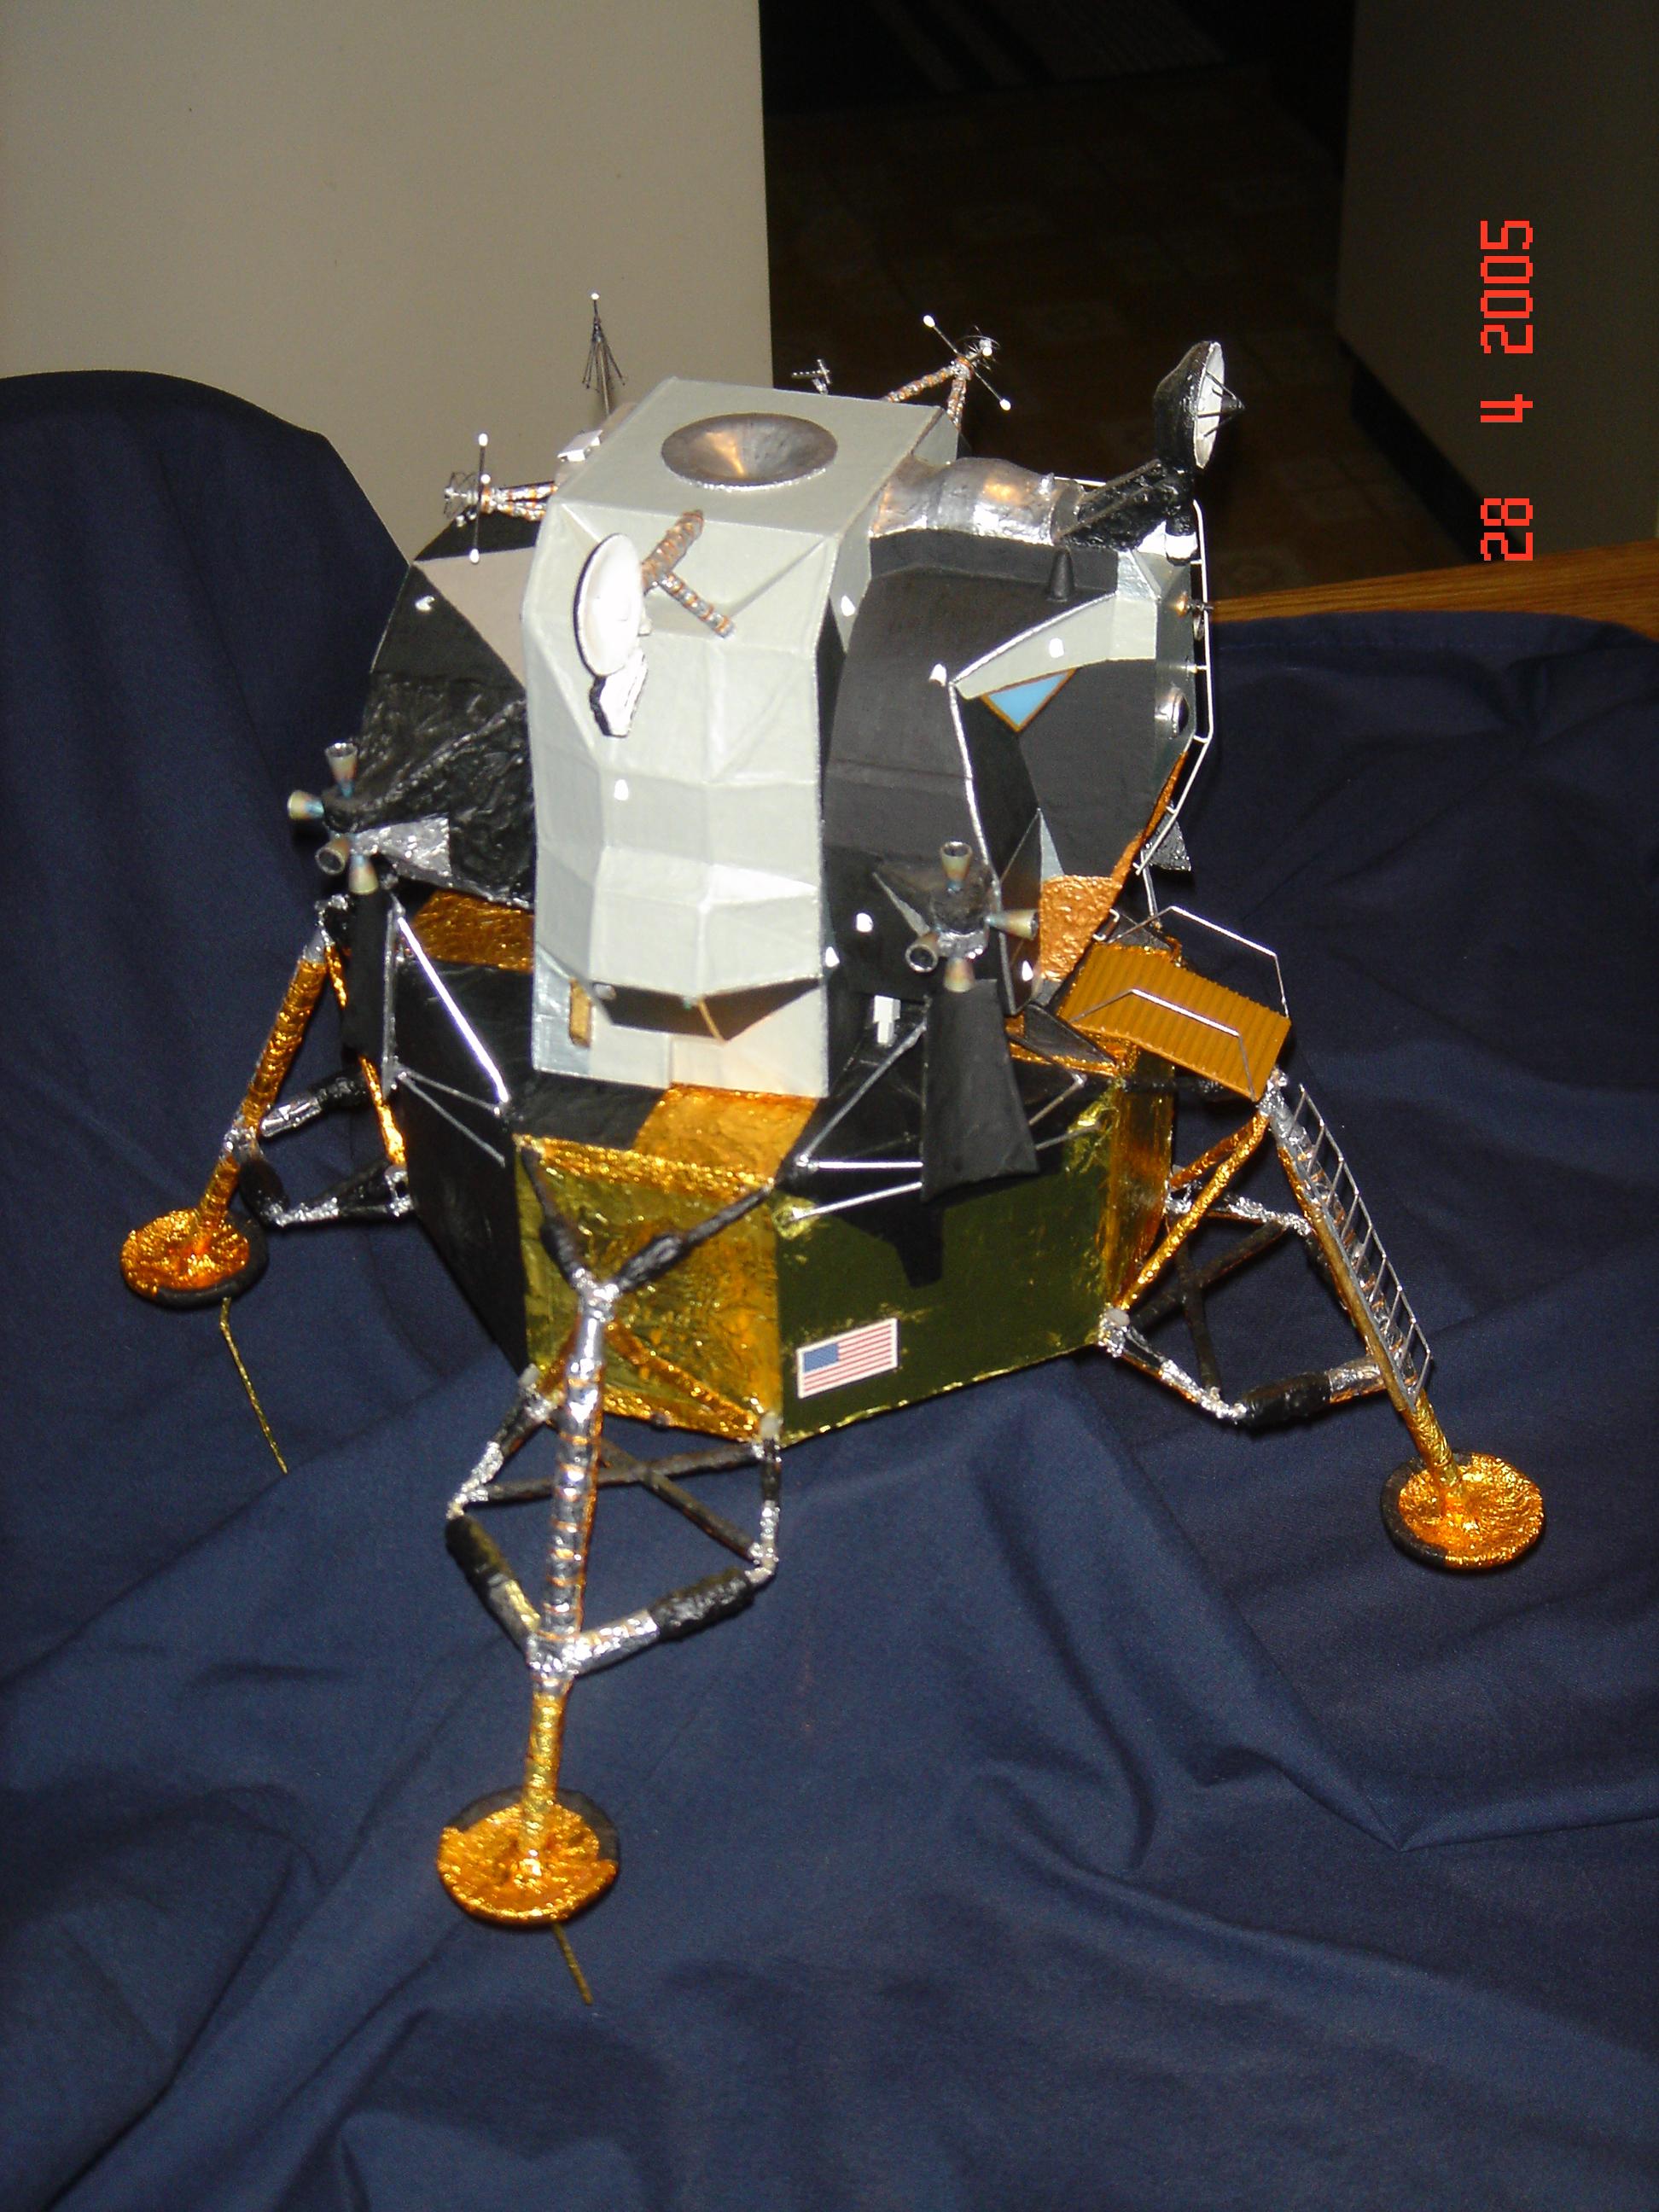 Surveyor Lunar Lander Model Kit (page 2) - Pics about space